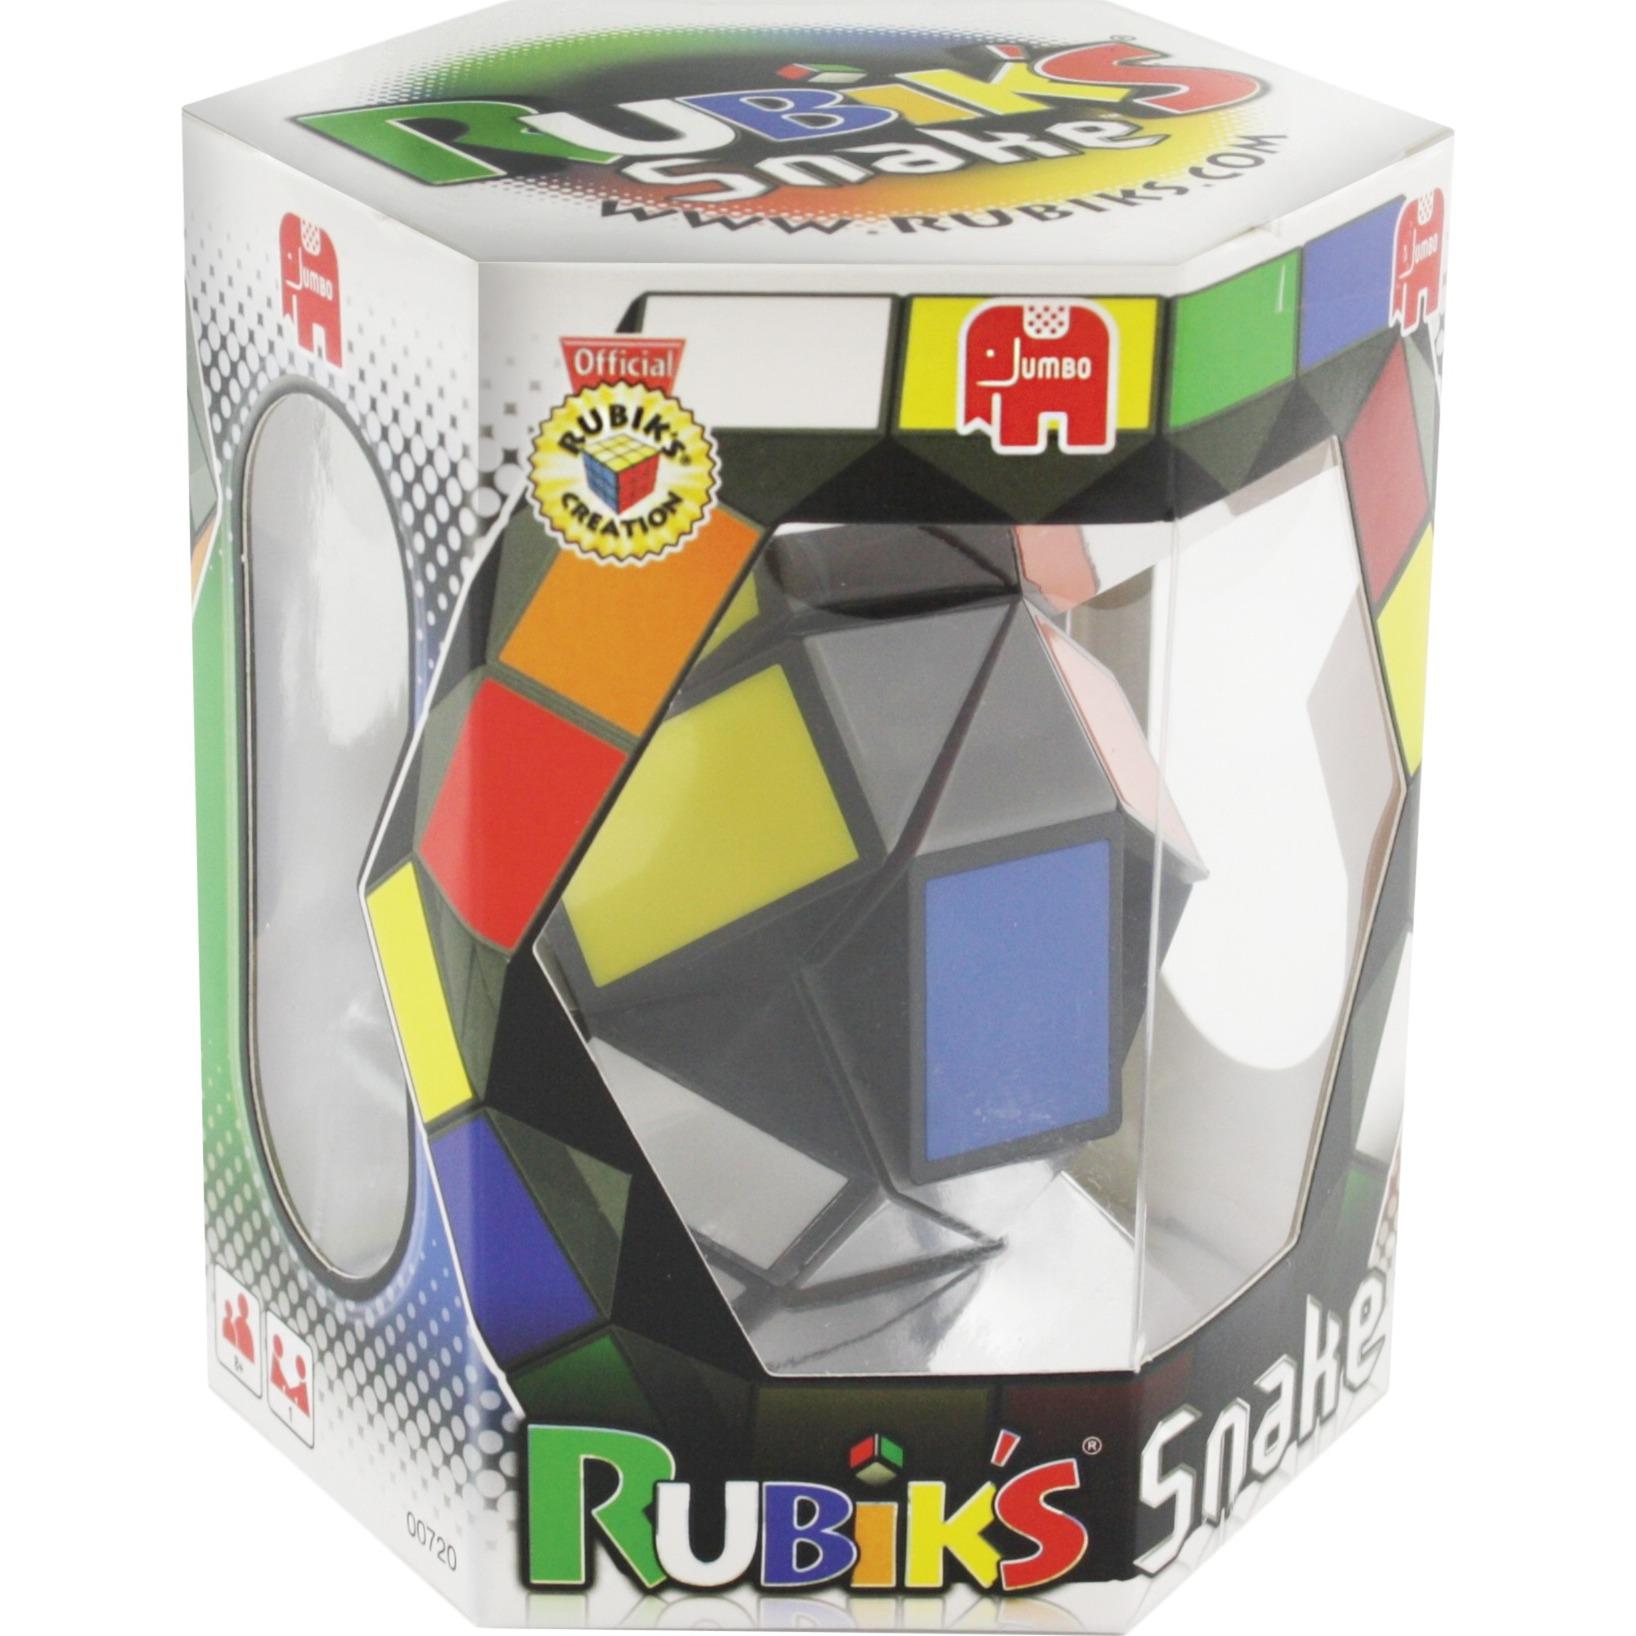 Rubik`s Snake, Jeu d'adresse